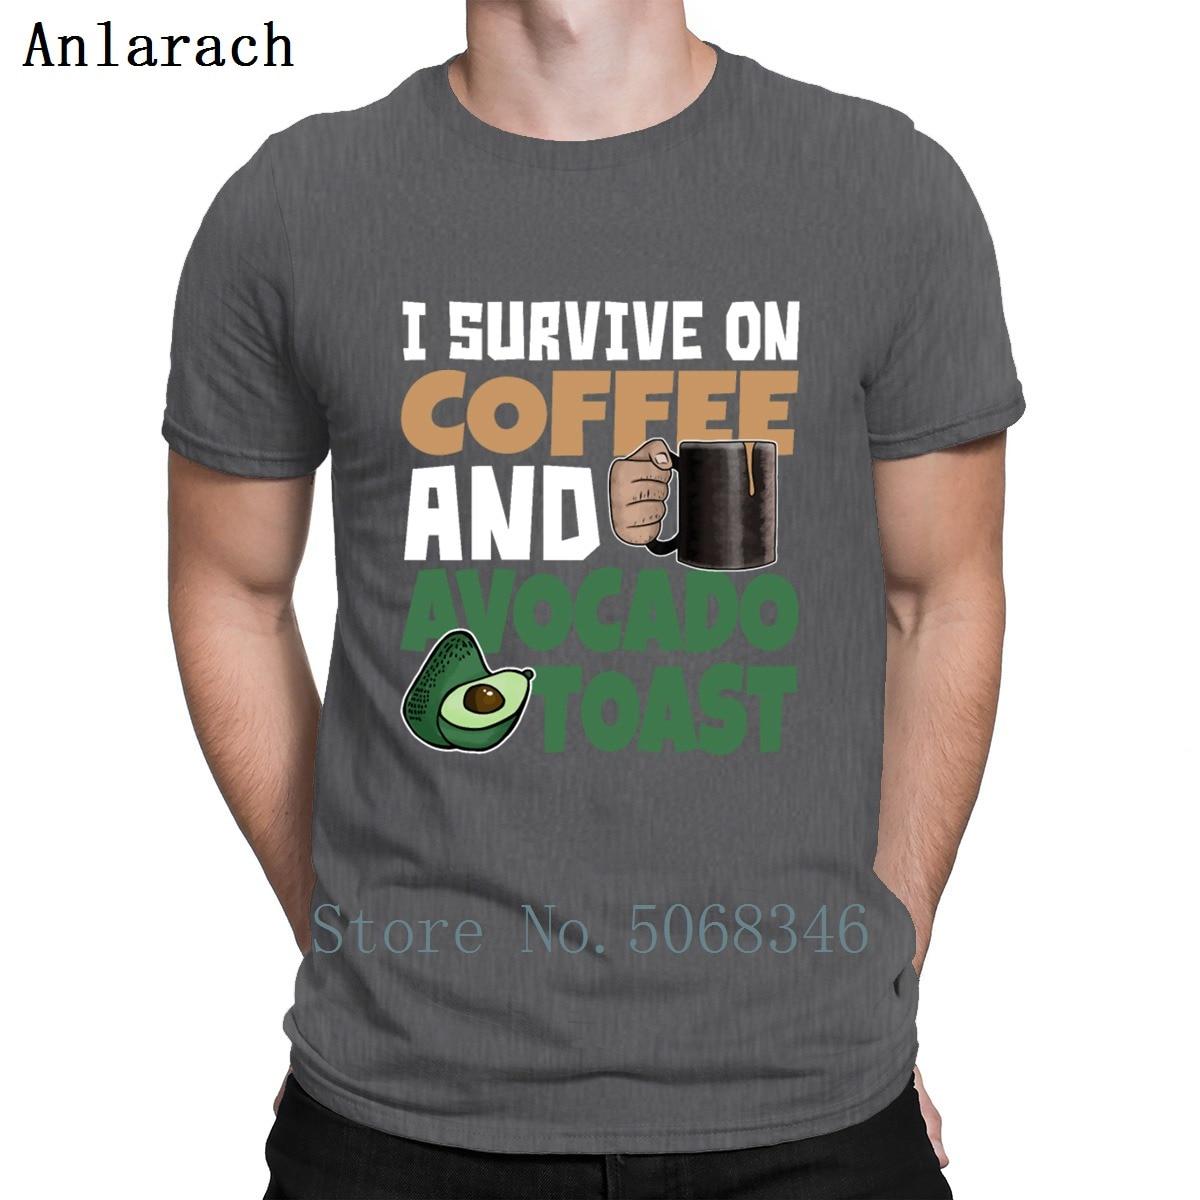 Keto Avocado Humor I Survive On Coffe And Avocado Toast T Shirt Gift Short Sleeve Kawaii Funny Casual Plus Size 3xl Shirt